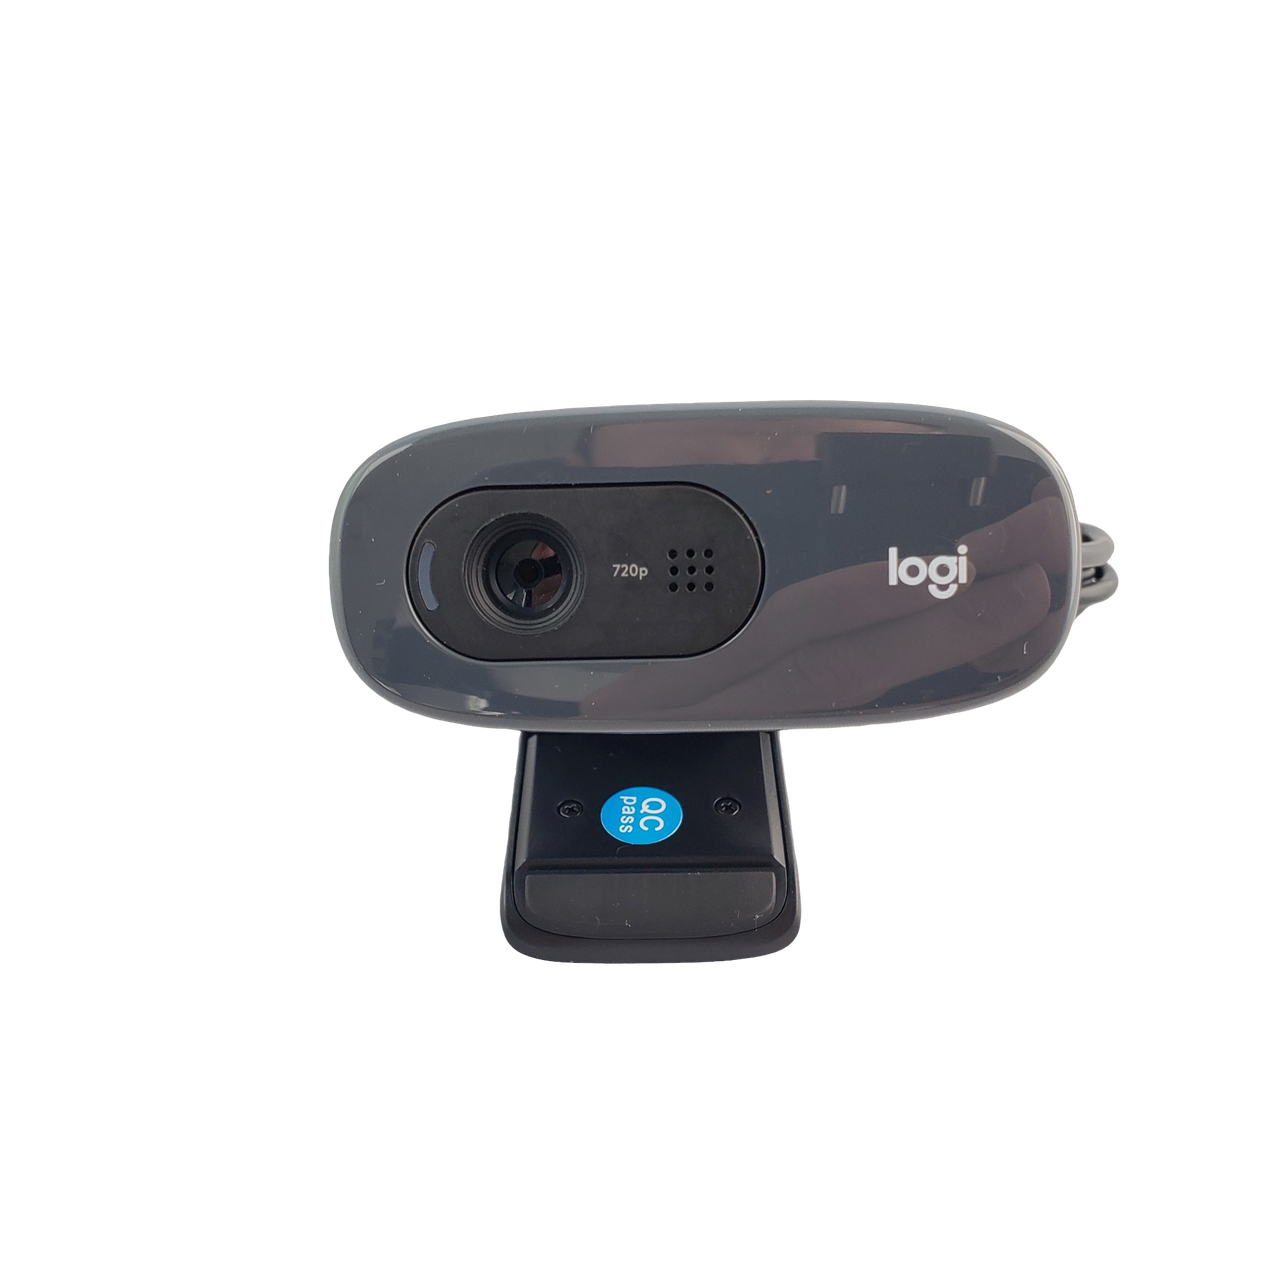 Веб-камера Logitech C270 HD Webcam Simple 720p video calls Black Витрина